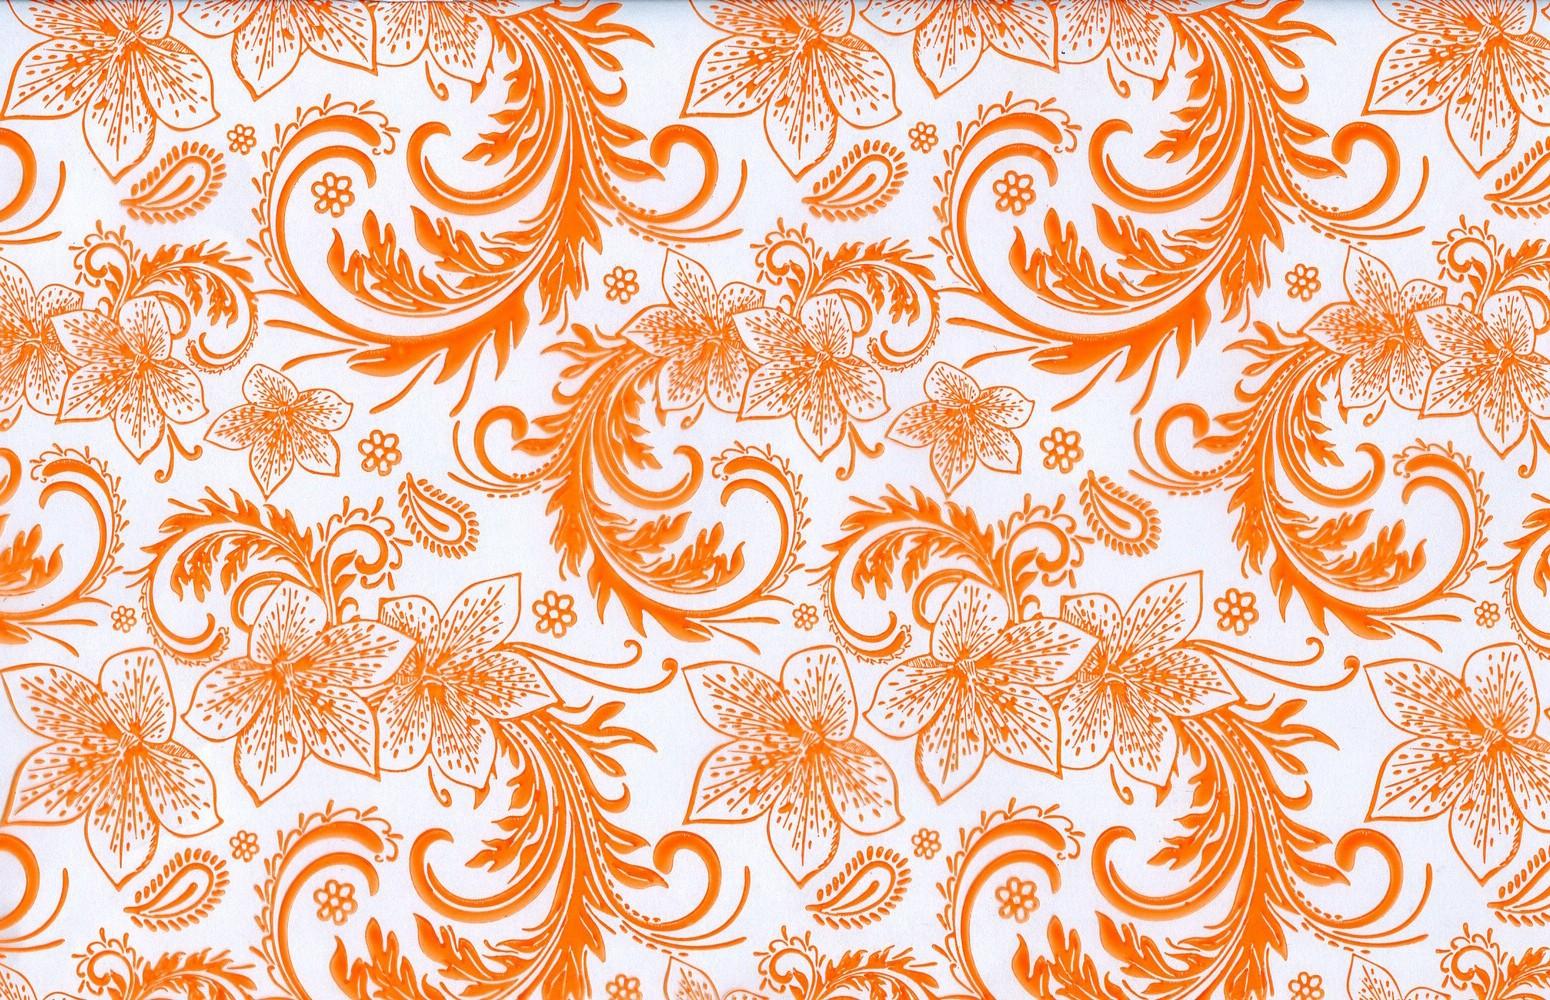 Кружево оранжевое